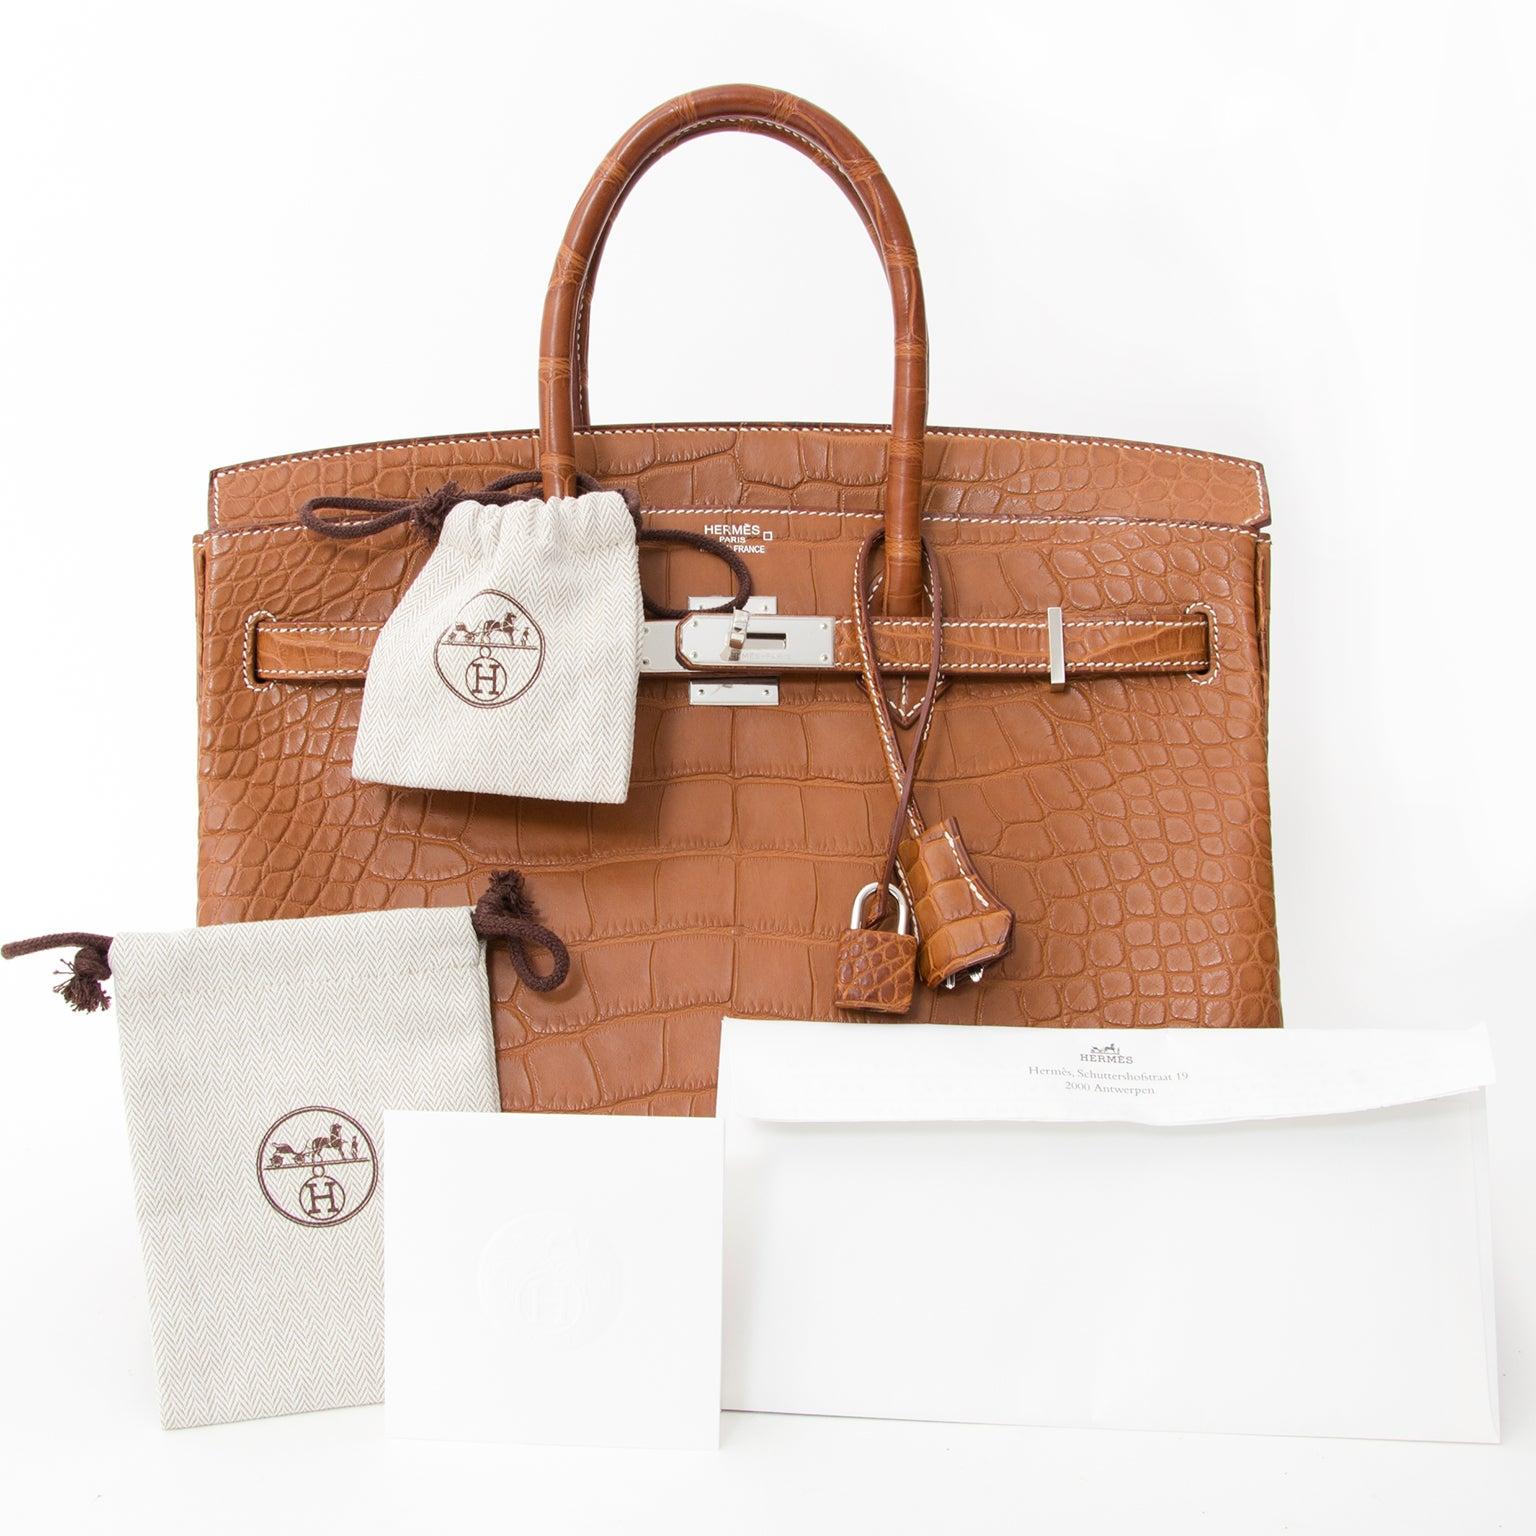 612557e03c25 Hermès 35cm Barenia Fauve Matte Alligator PHW Birkin Bag at 1stdibs